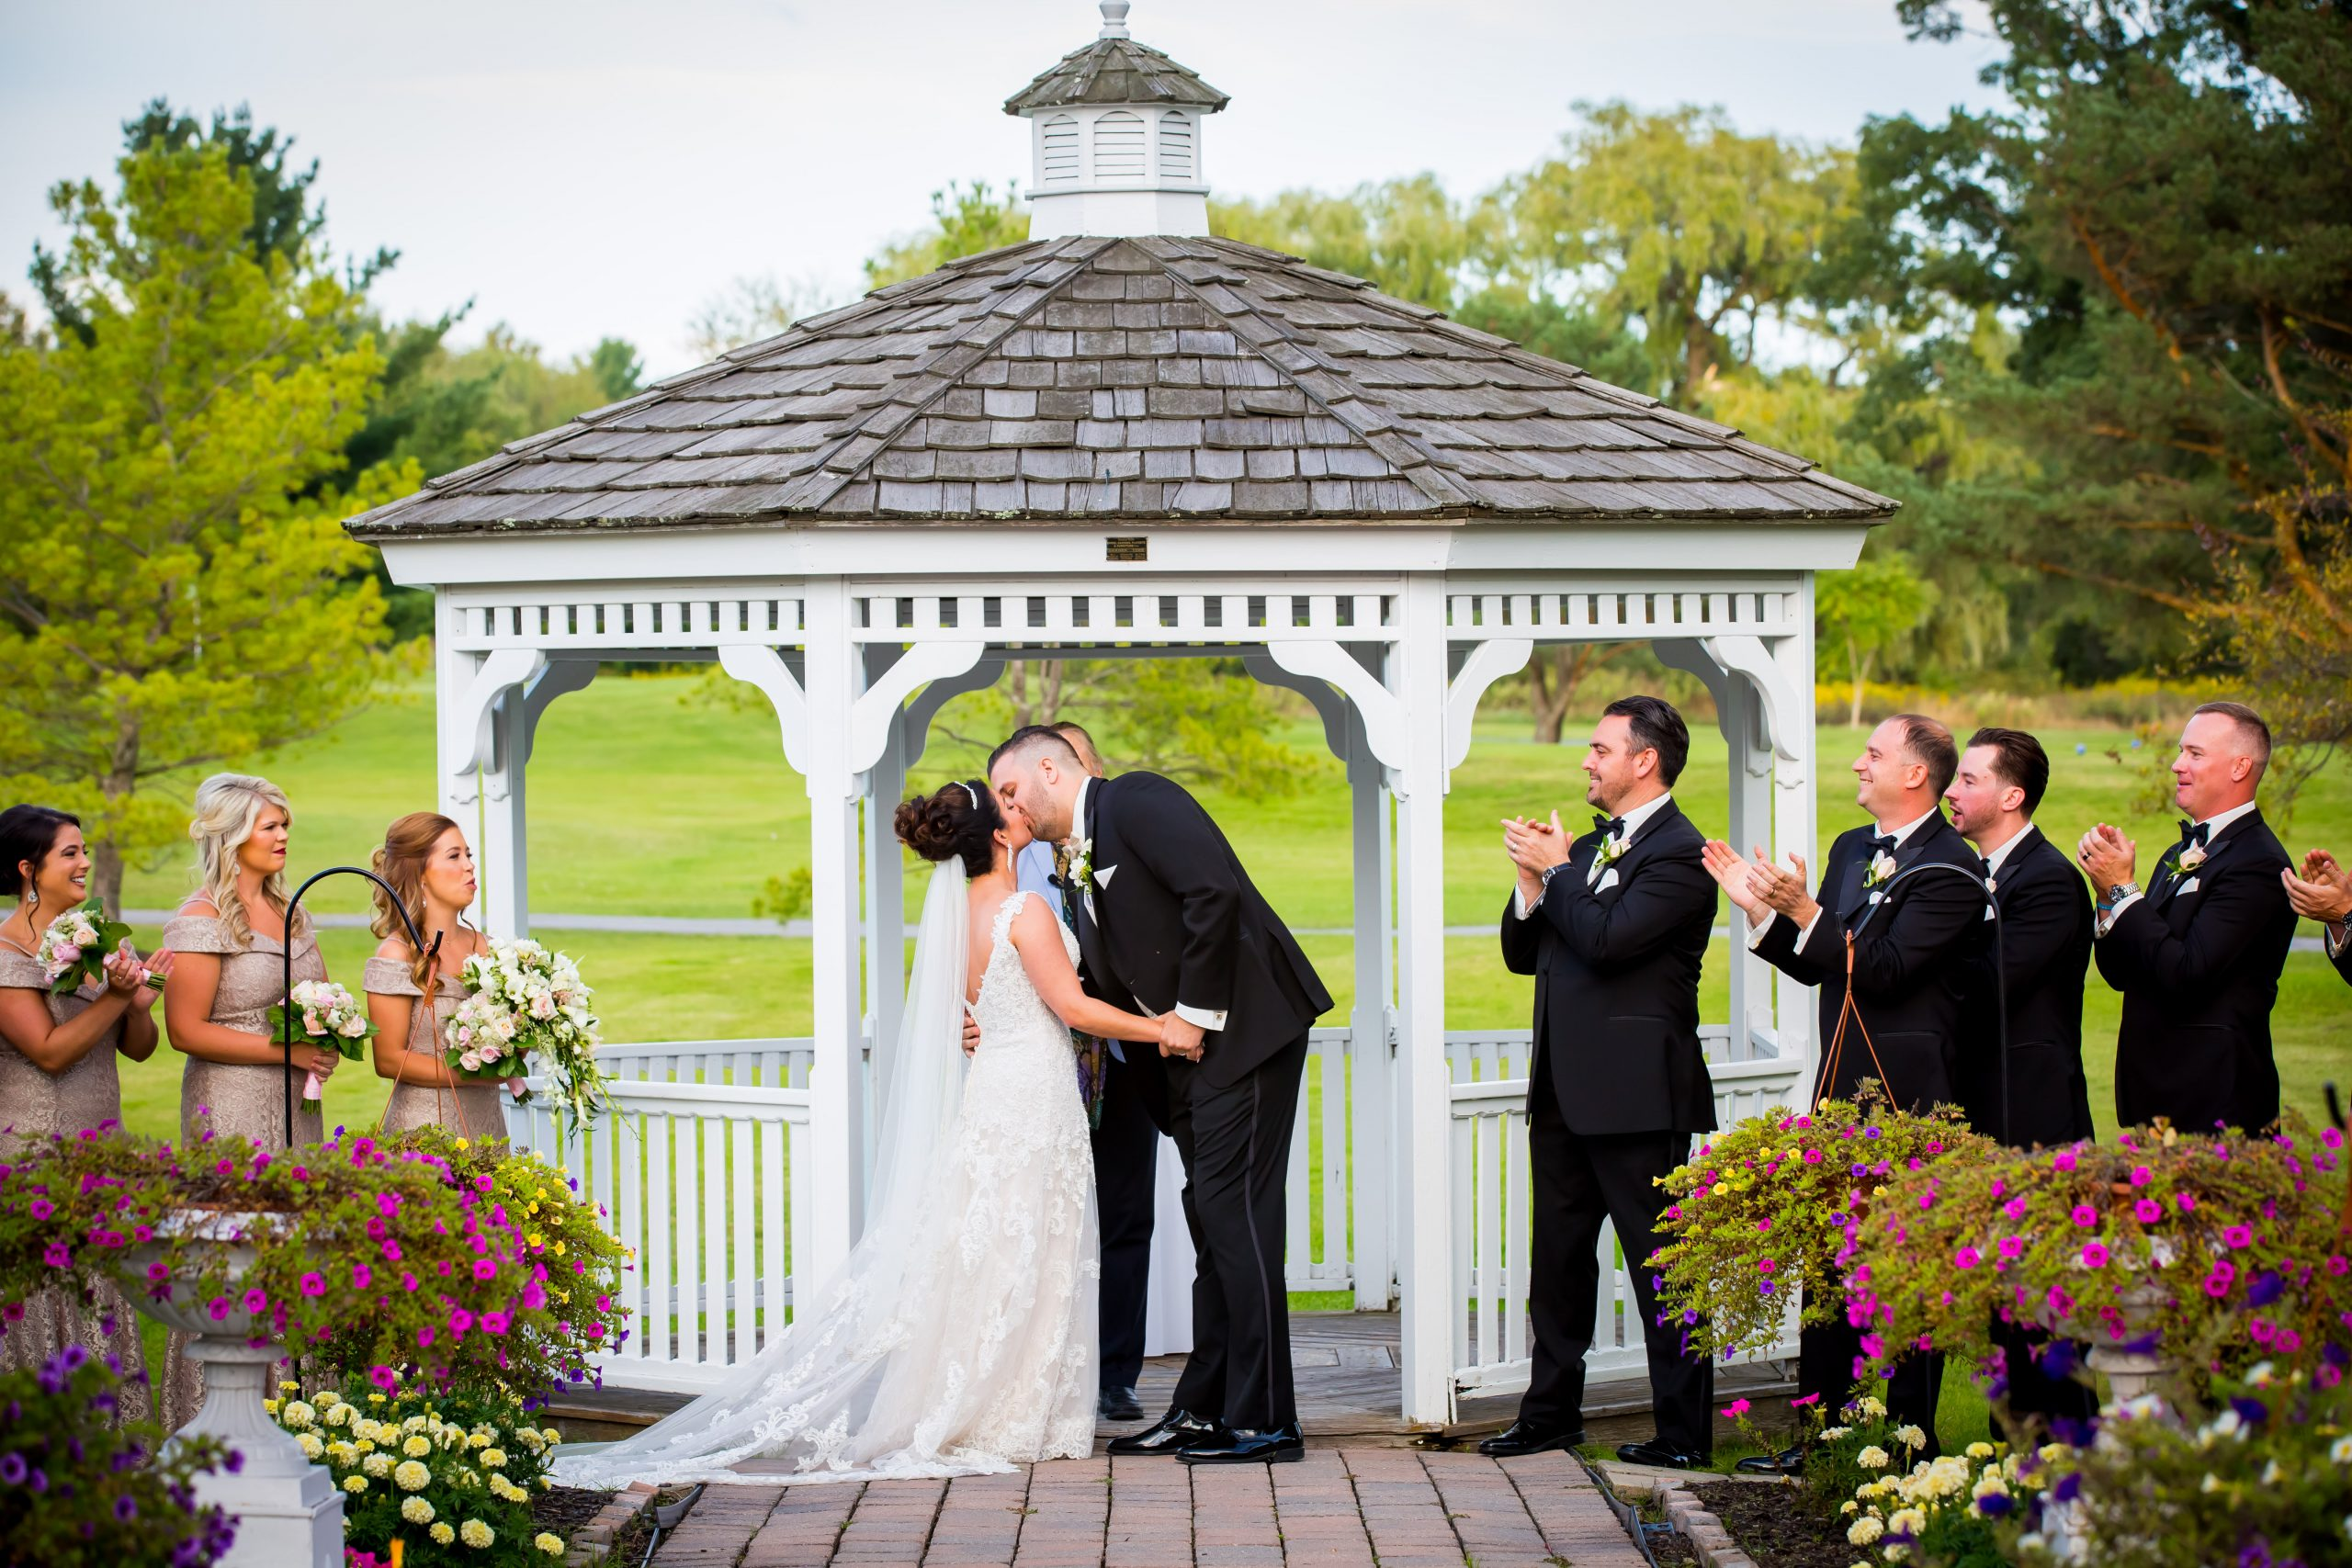 Victori_Rob_Mohawk River Country Club Wedding-31.jpg